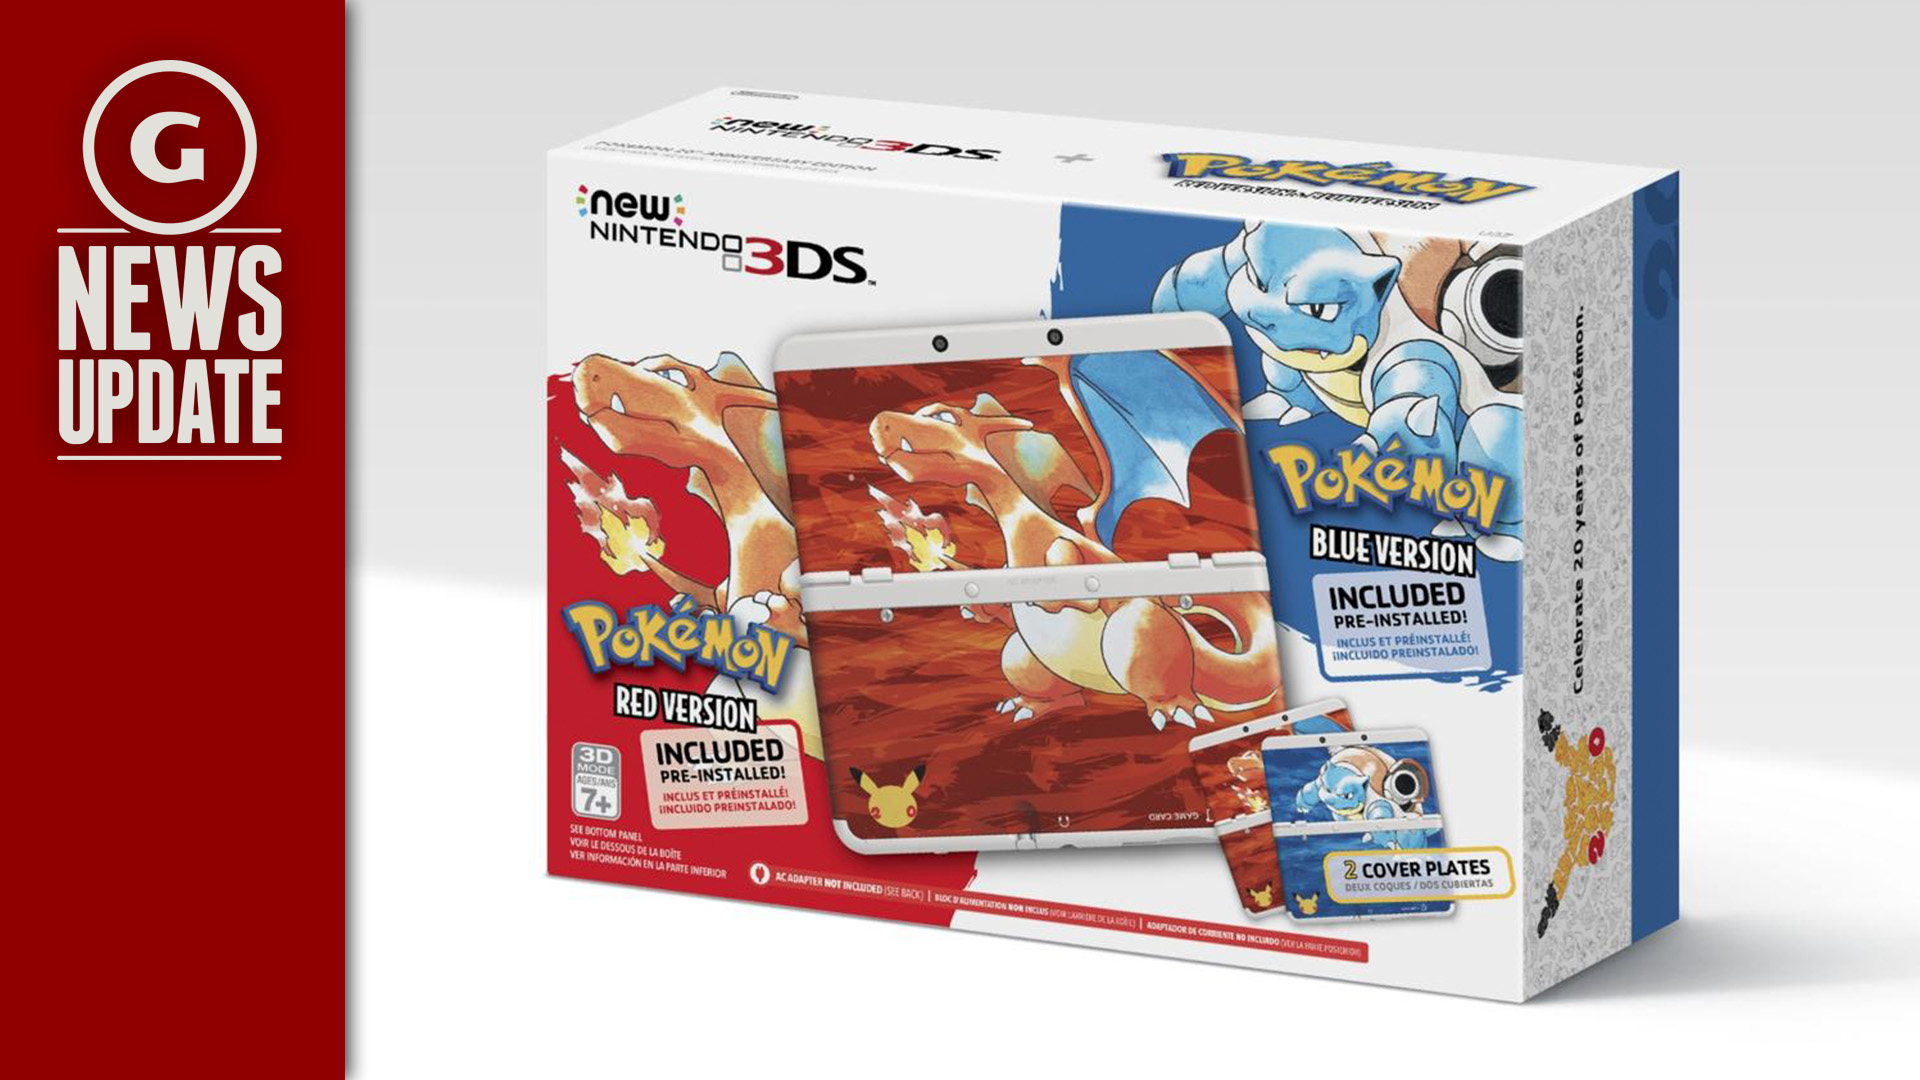 GS News Update: Pokemon 20th Anniversary 3DS Bundles Coming Soon